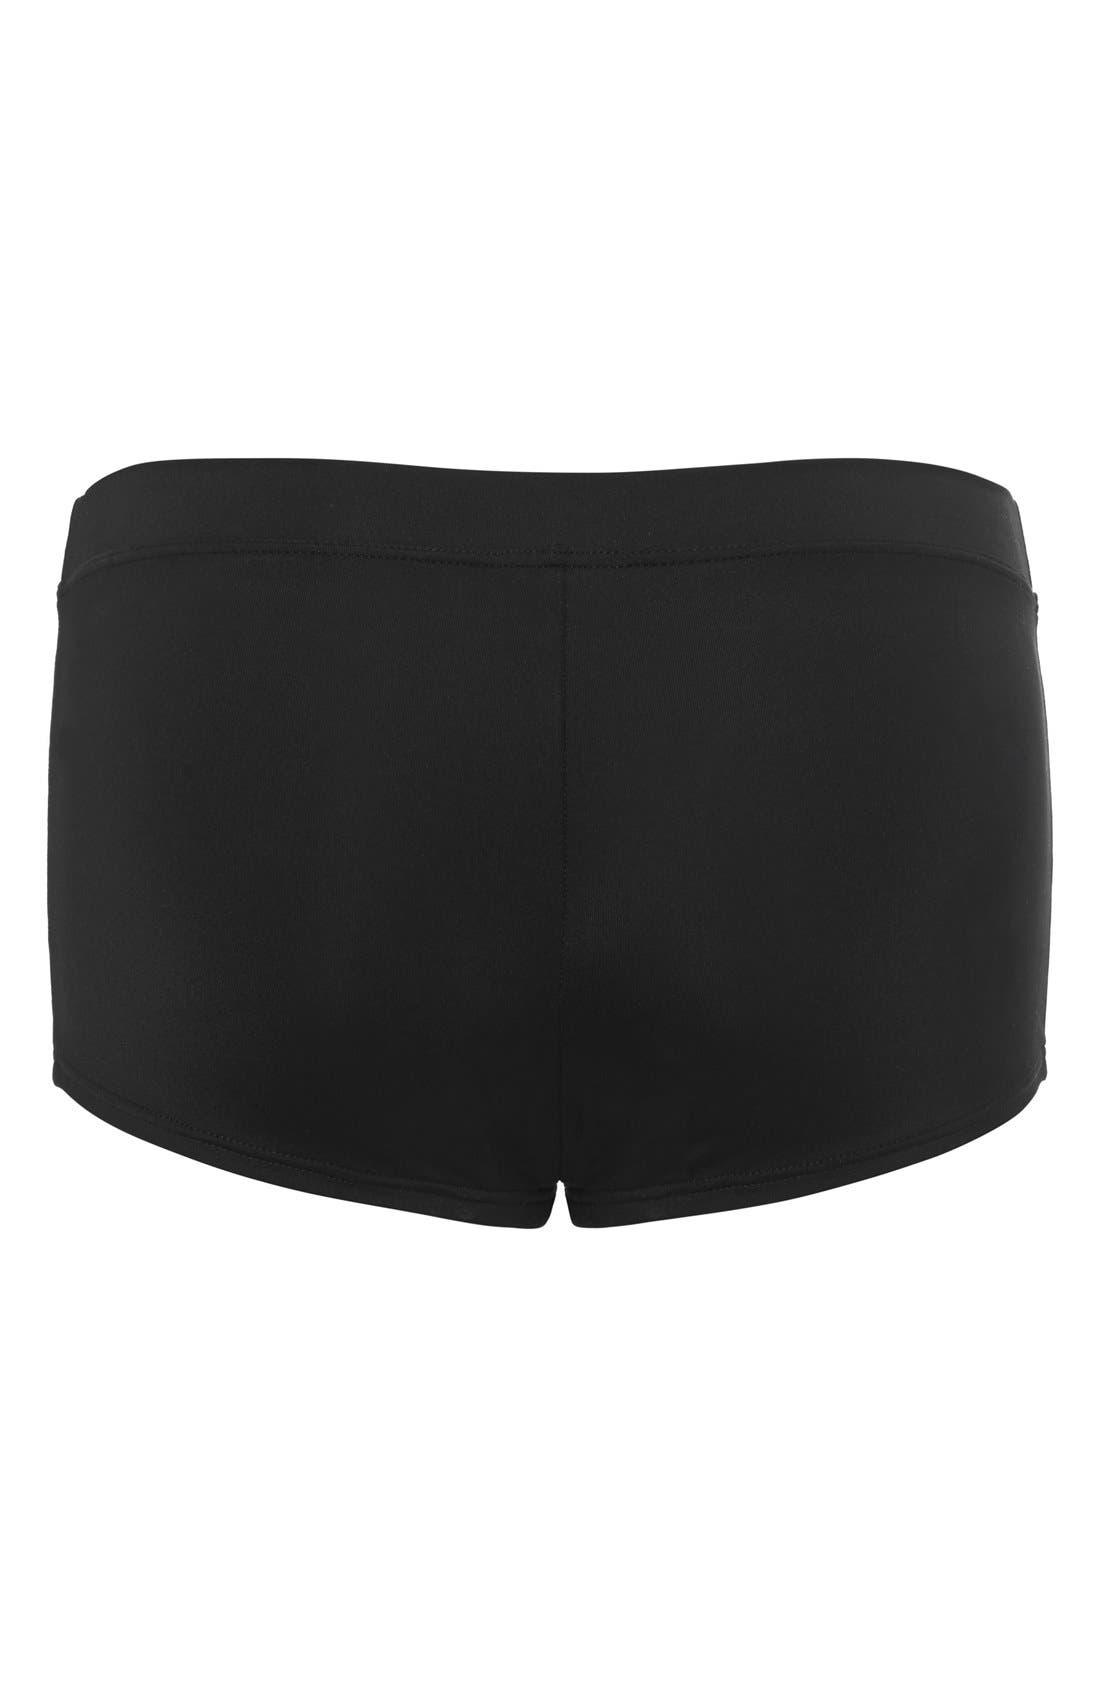 'Saint Tropez' Maternity Boyshort Swim Bottoms,                             Alternate thumbnail 2, color,                             Black